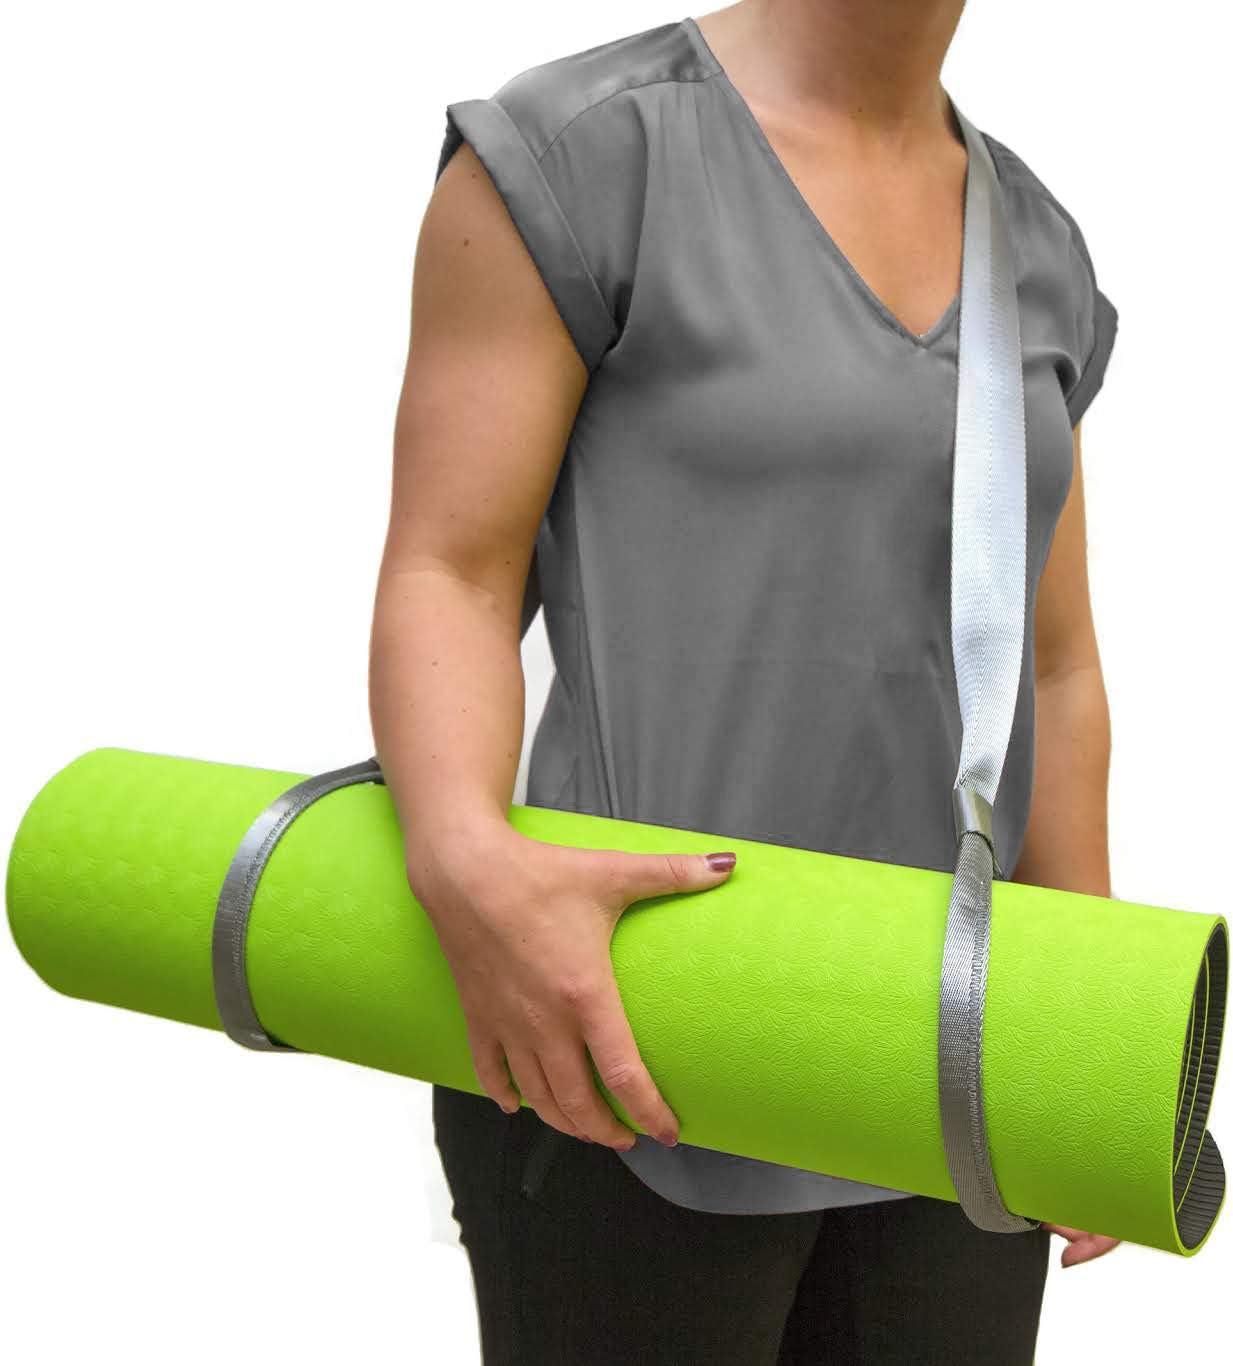 1x Convenient Yoga Mat Sling Carrier Shoulder Carry Strap Belt Gradient Ramp#